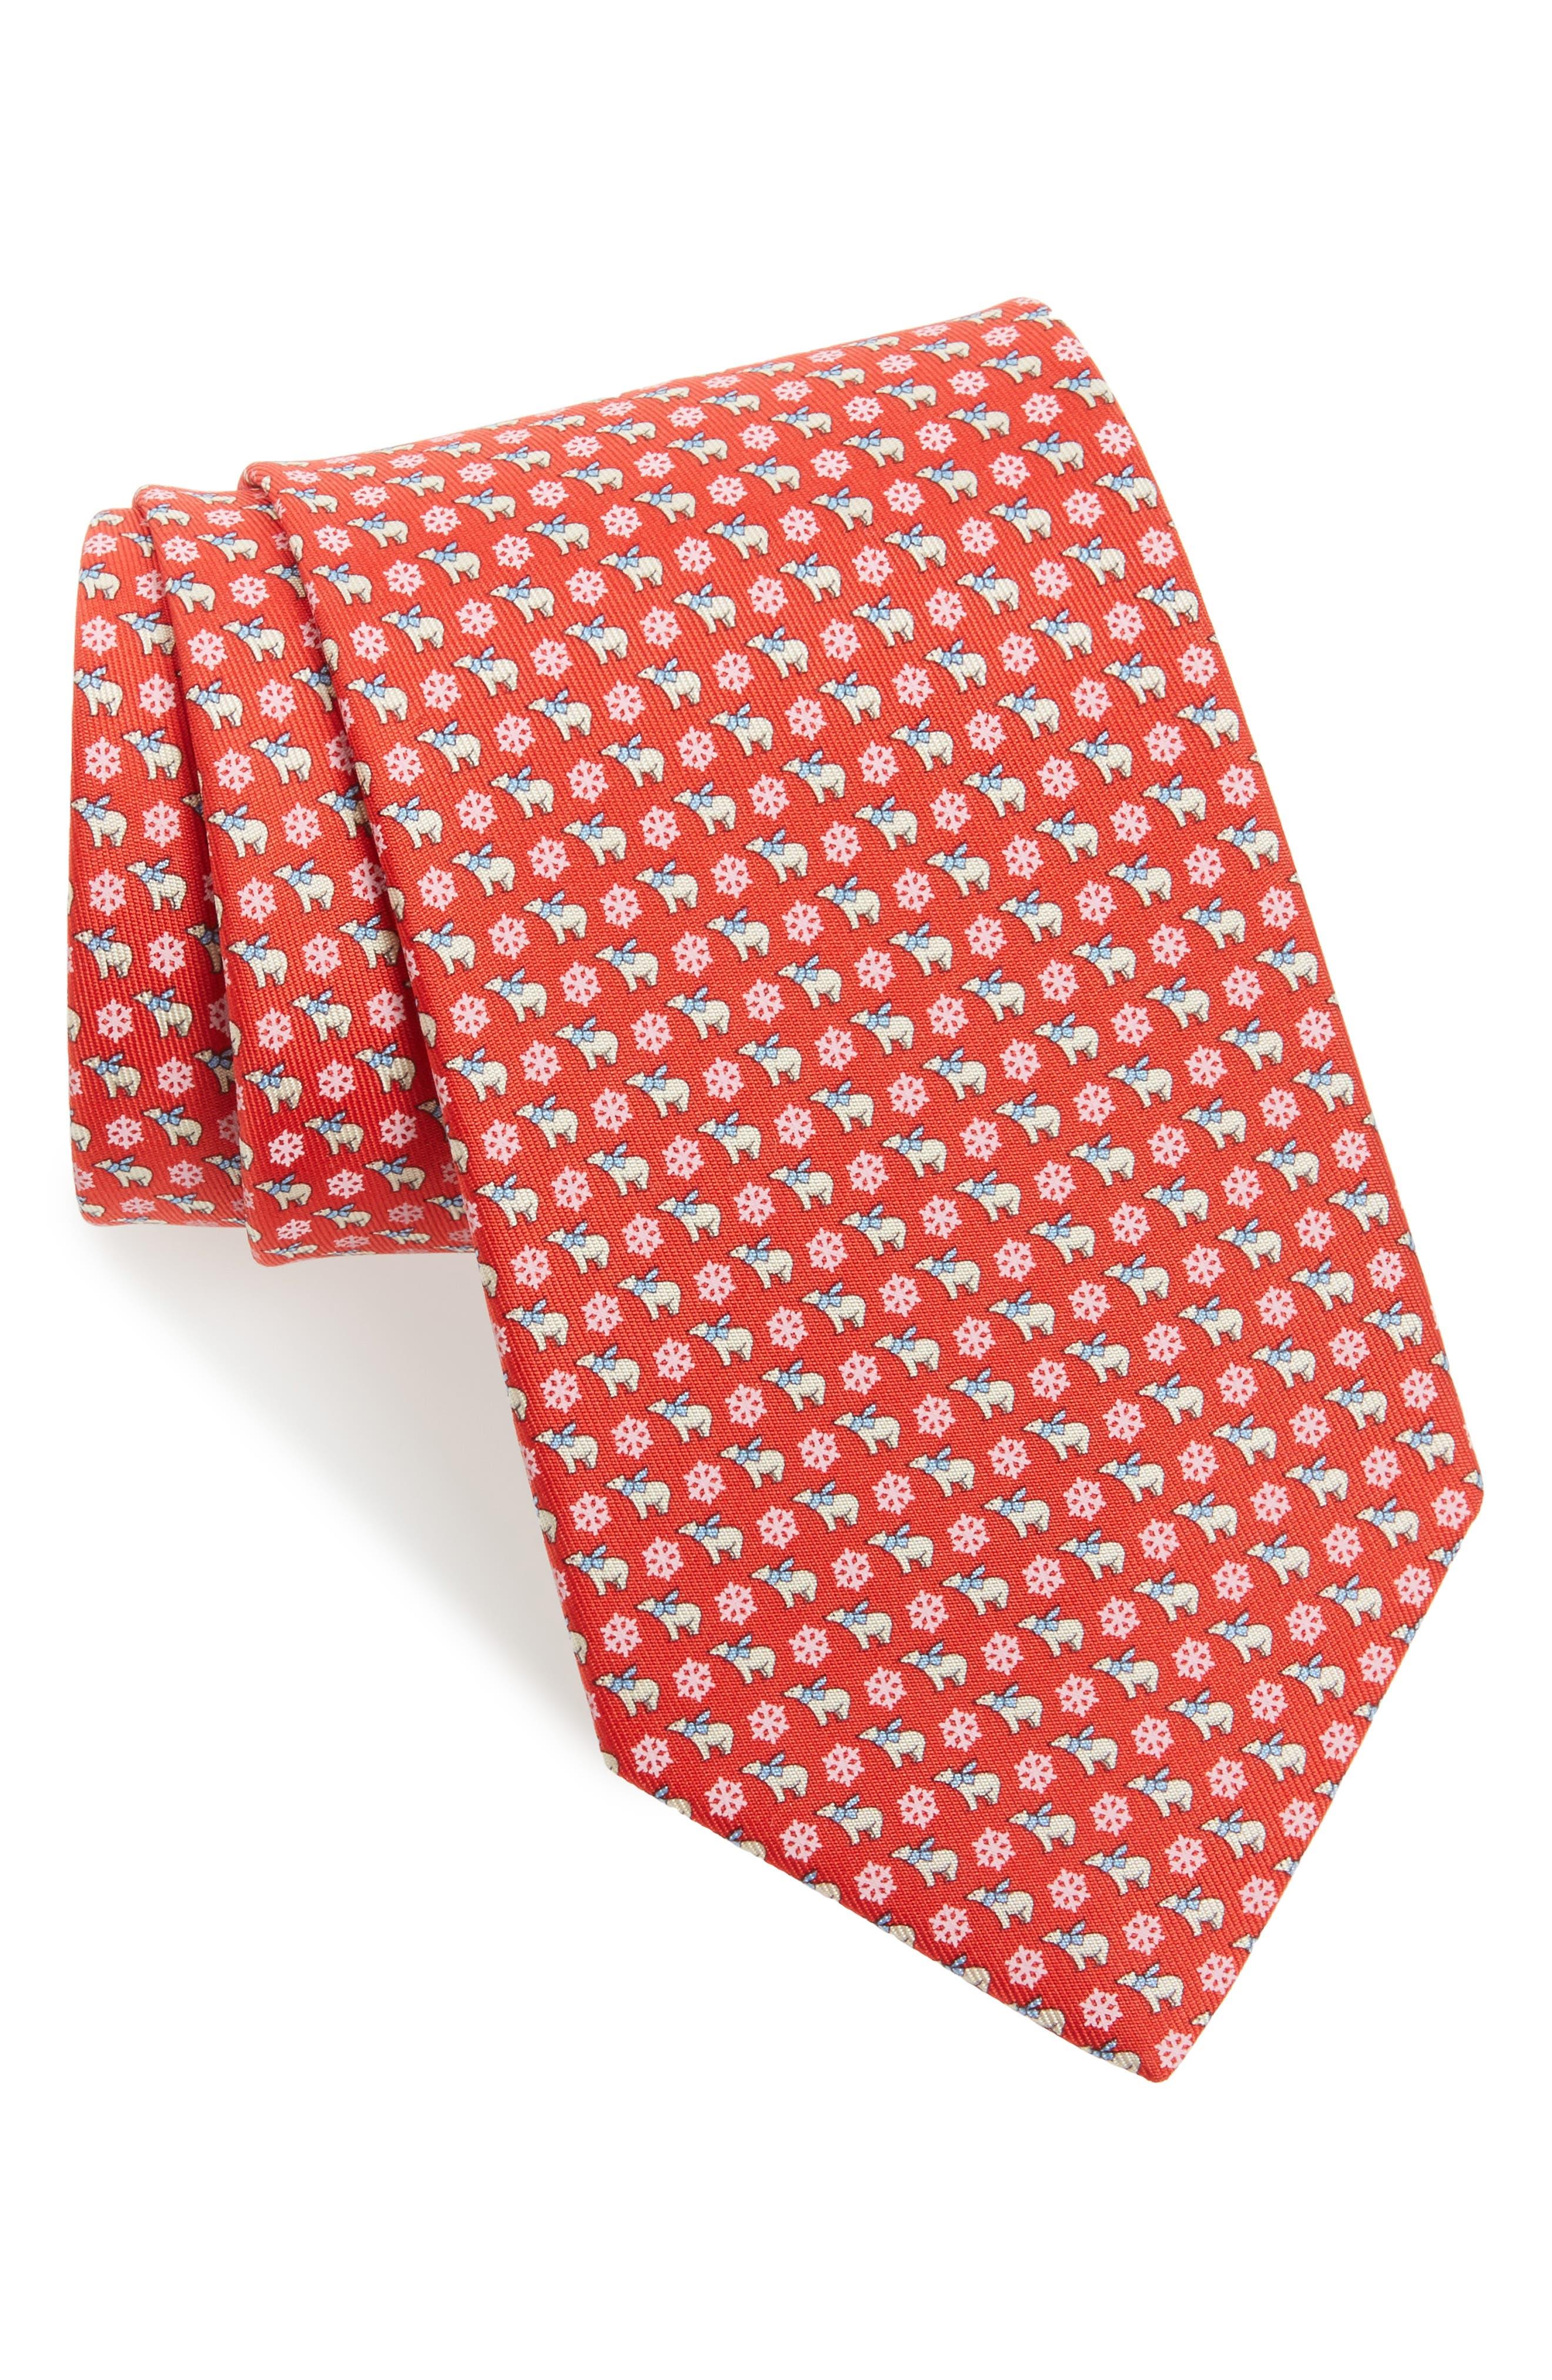 Bear Print Silk Tie,                             Main thumbnail 1, color,                             Red